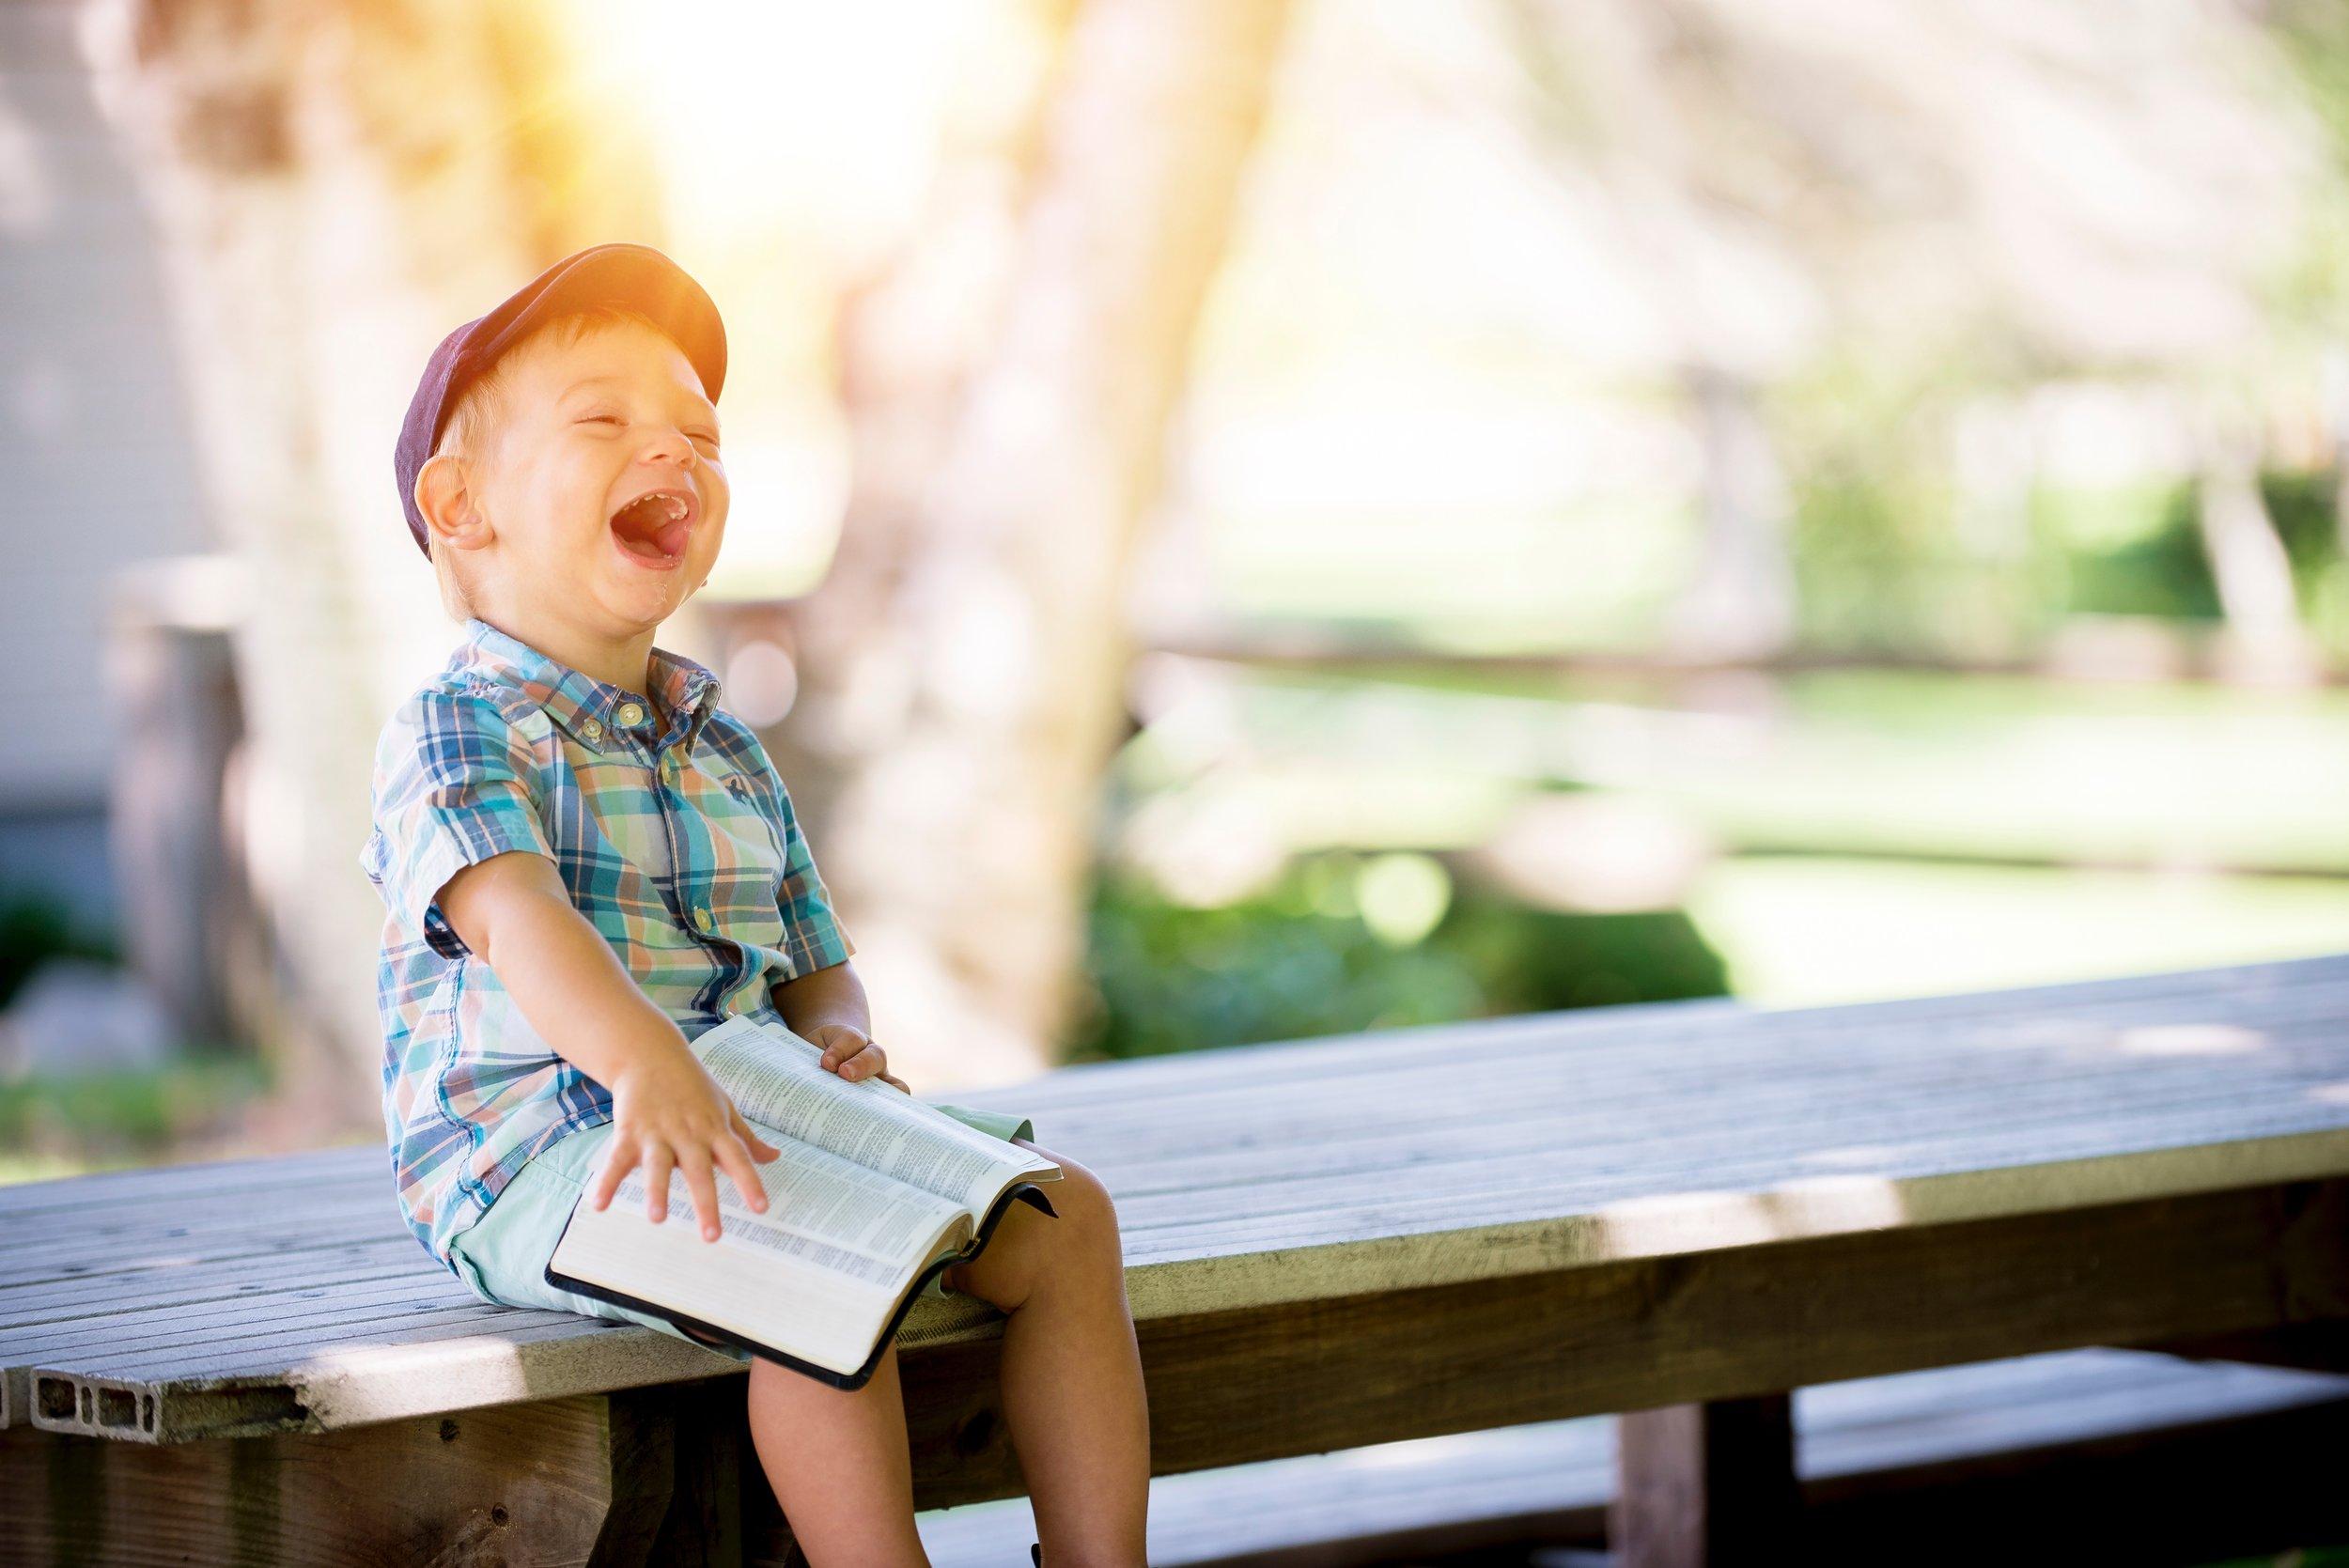 Dad-Joke Baptist Church - Lighten up! It's Ok to Laugh.